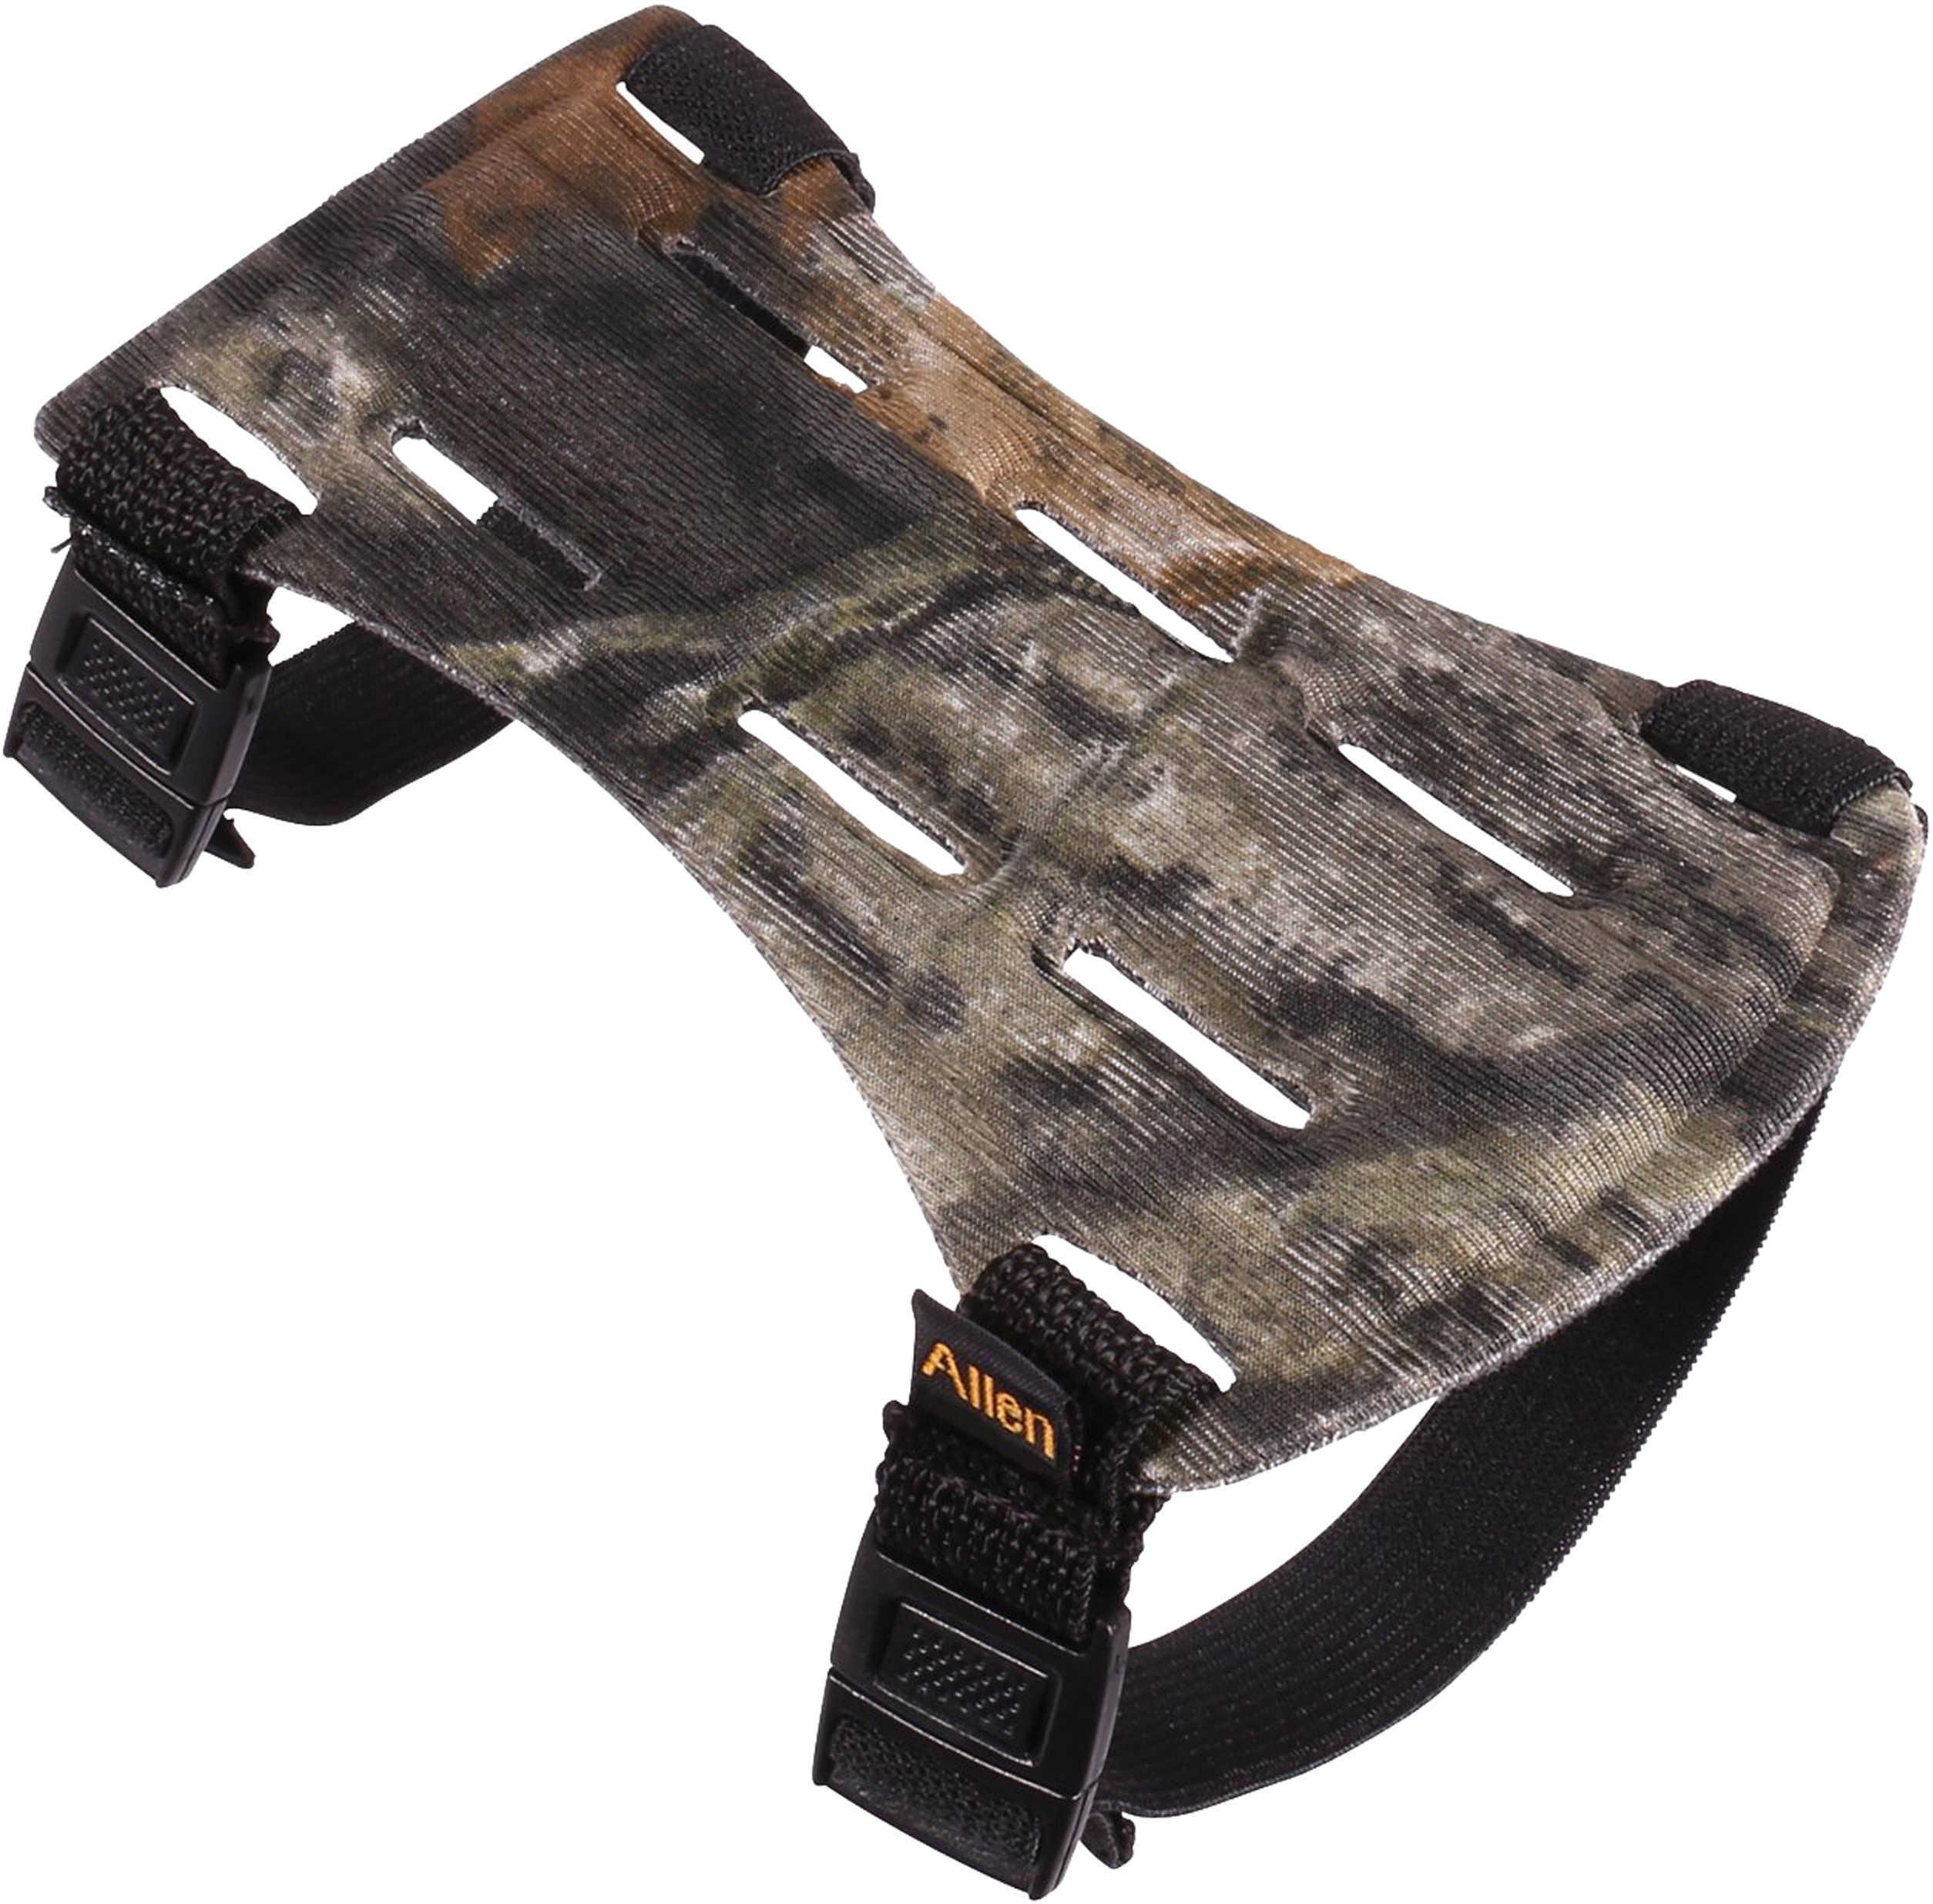 Allen Cases Armguard Saddlecloth Camo 6.5In 2-Strap